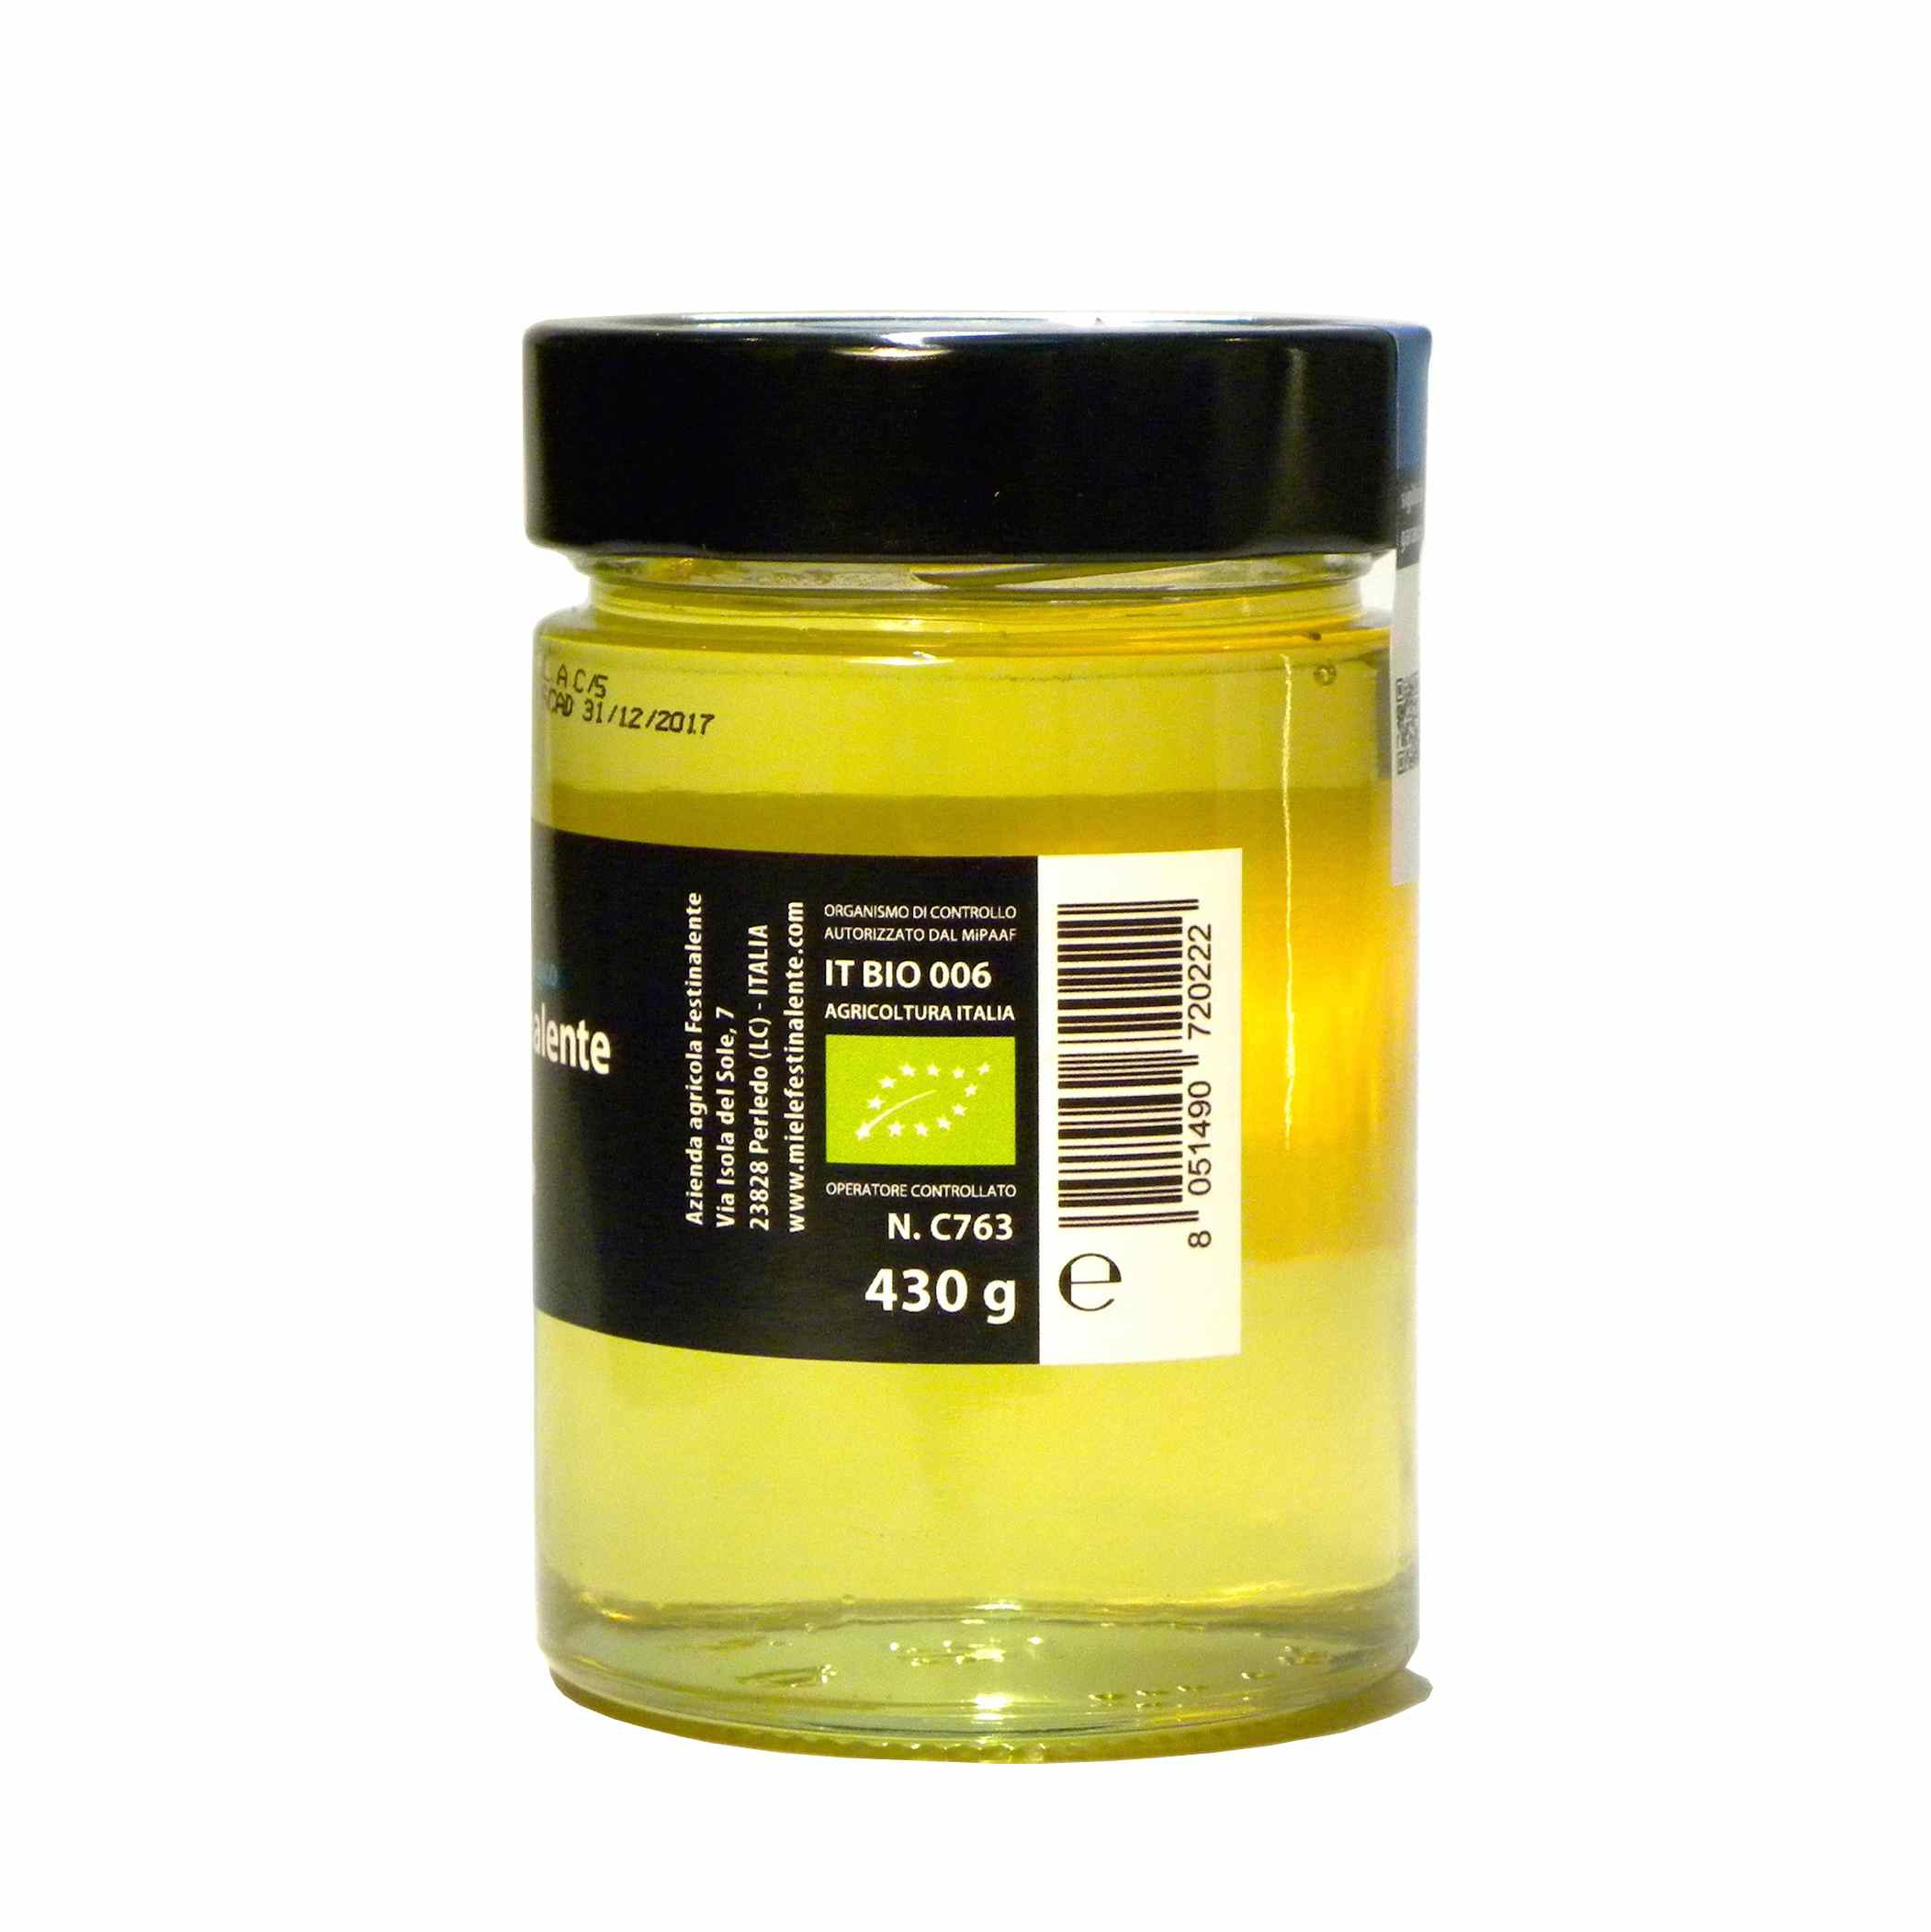 Festinalente miele bio millefiori alpi – Festinalente organic raw acacia honey – Gustorotondo – Italian food boutique